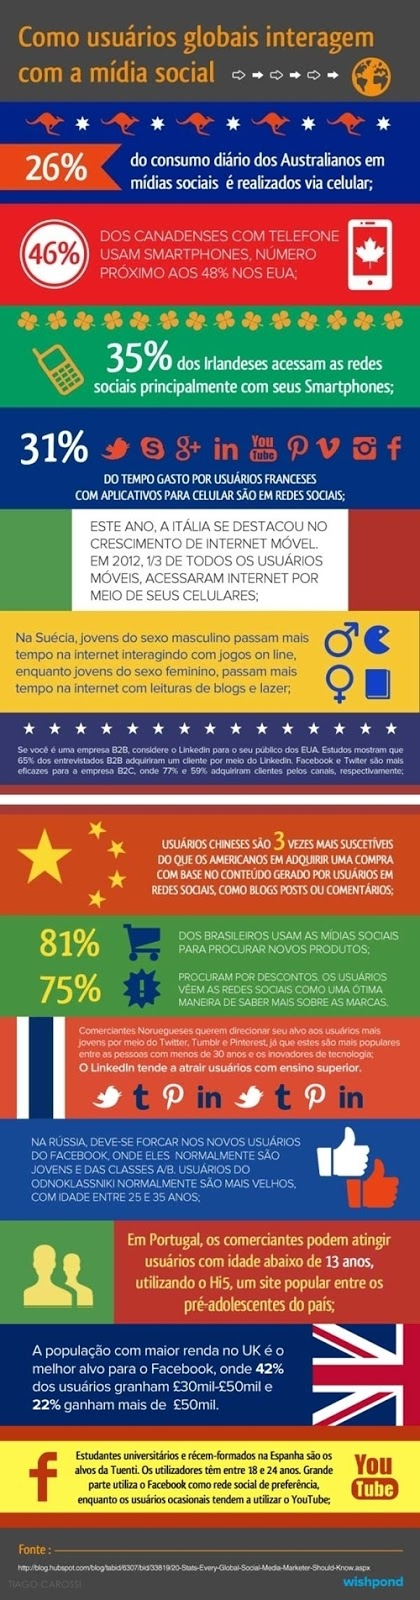 infografico paises midias sociais redes sociais